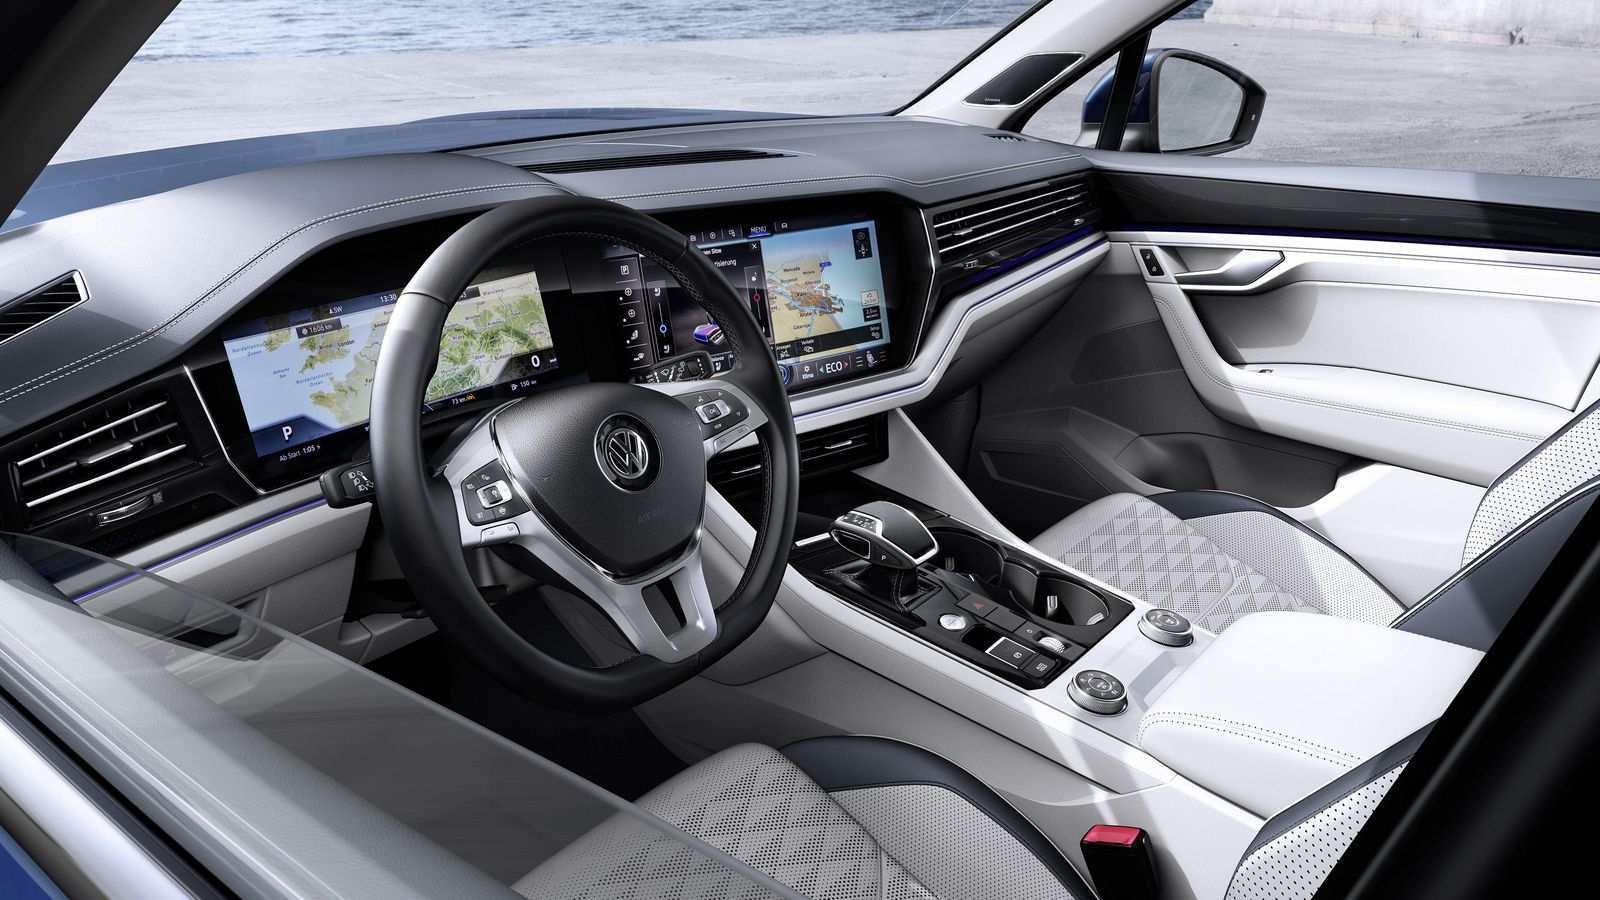 86 New 2019 Volkswagen Touareg Overview for 2019 Volkswagen Touareg